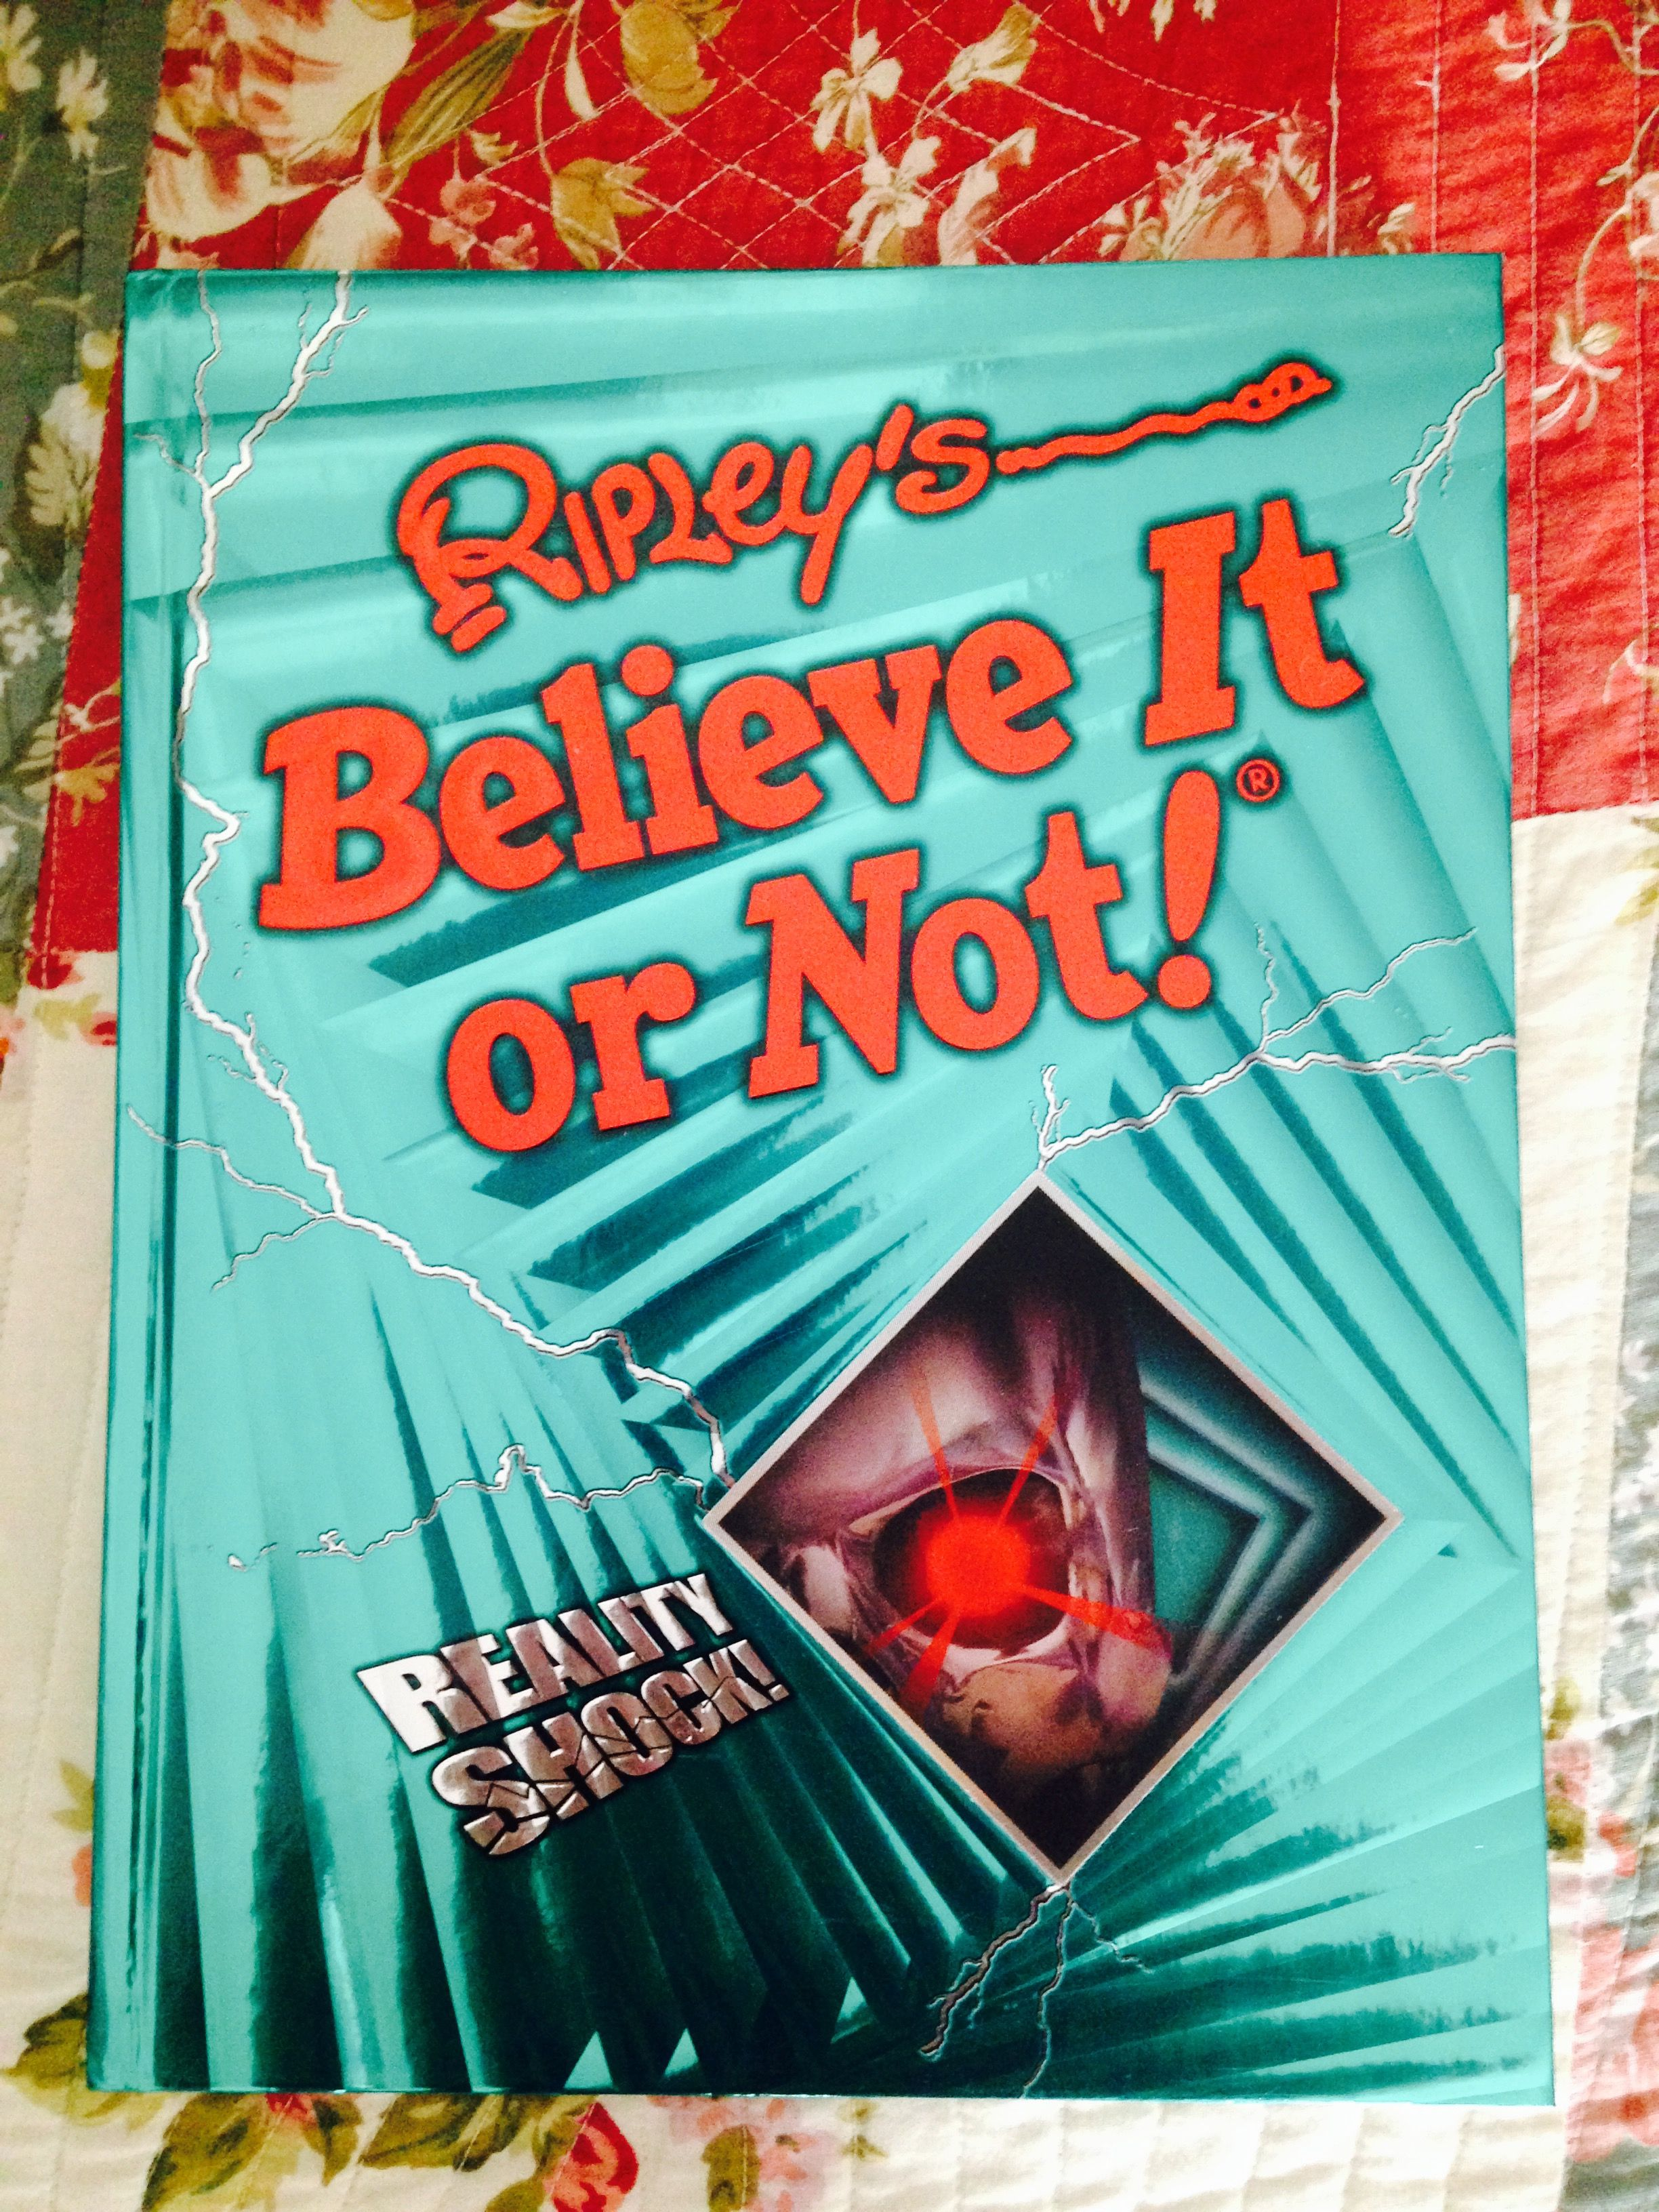 Believe it or not. In meinem Bücherregal. #ripleysbelieveitornot